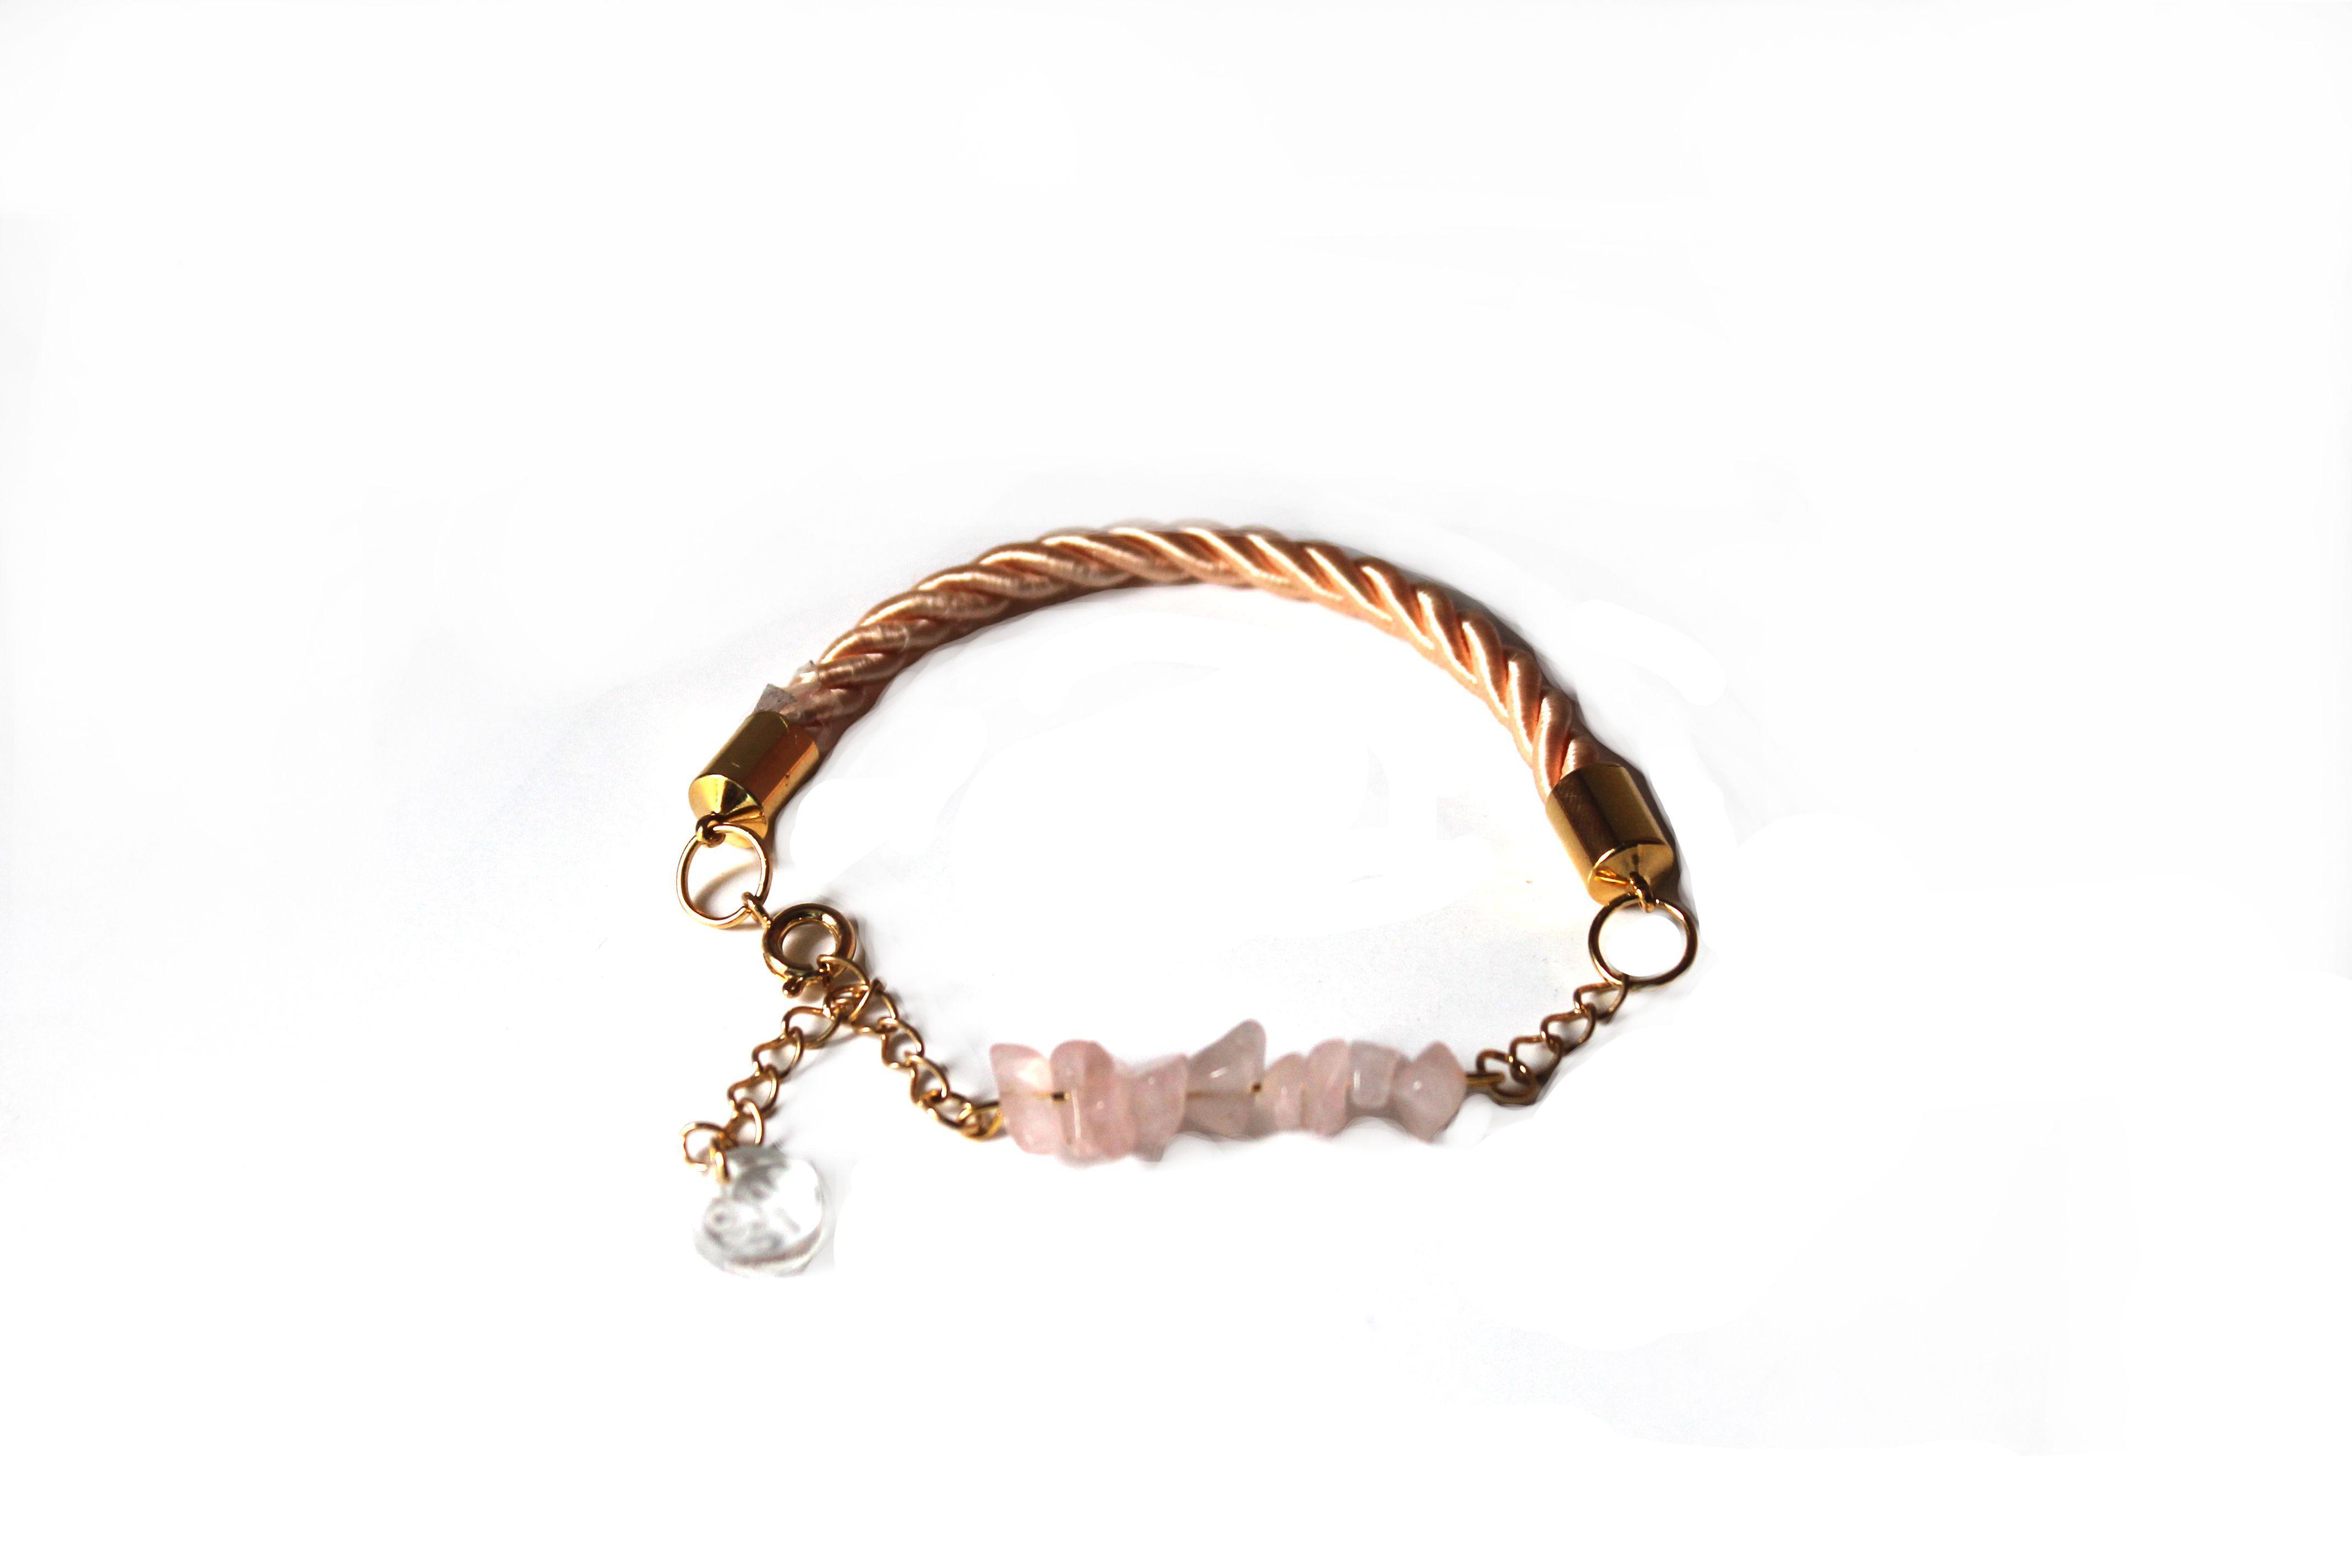 http://seasonsinwonderland.tictail.com/product/bracelet-free